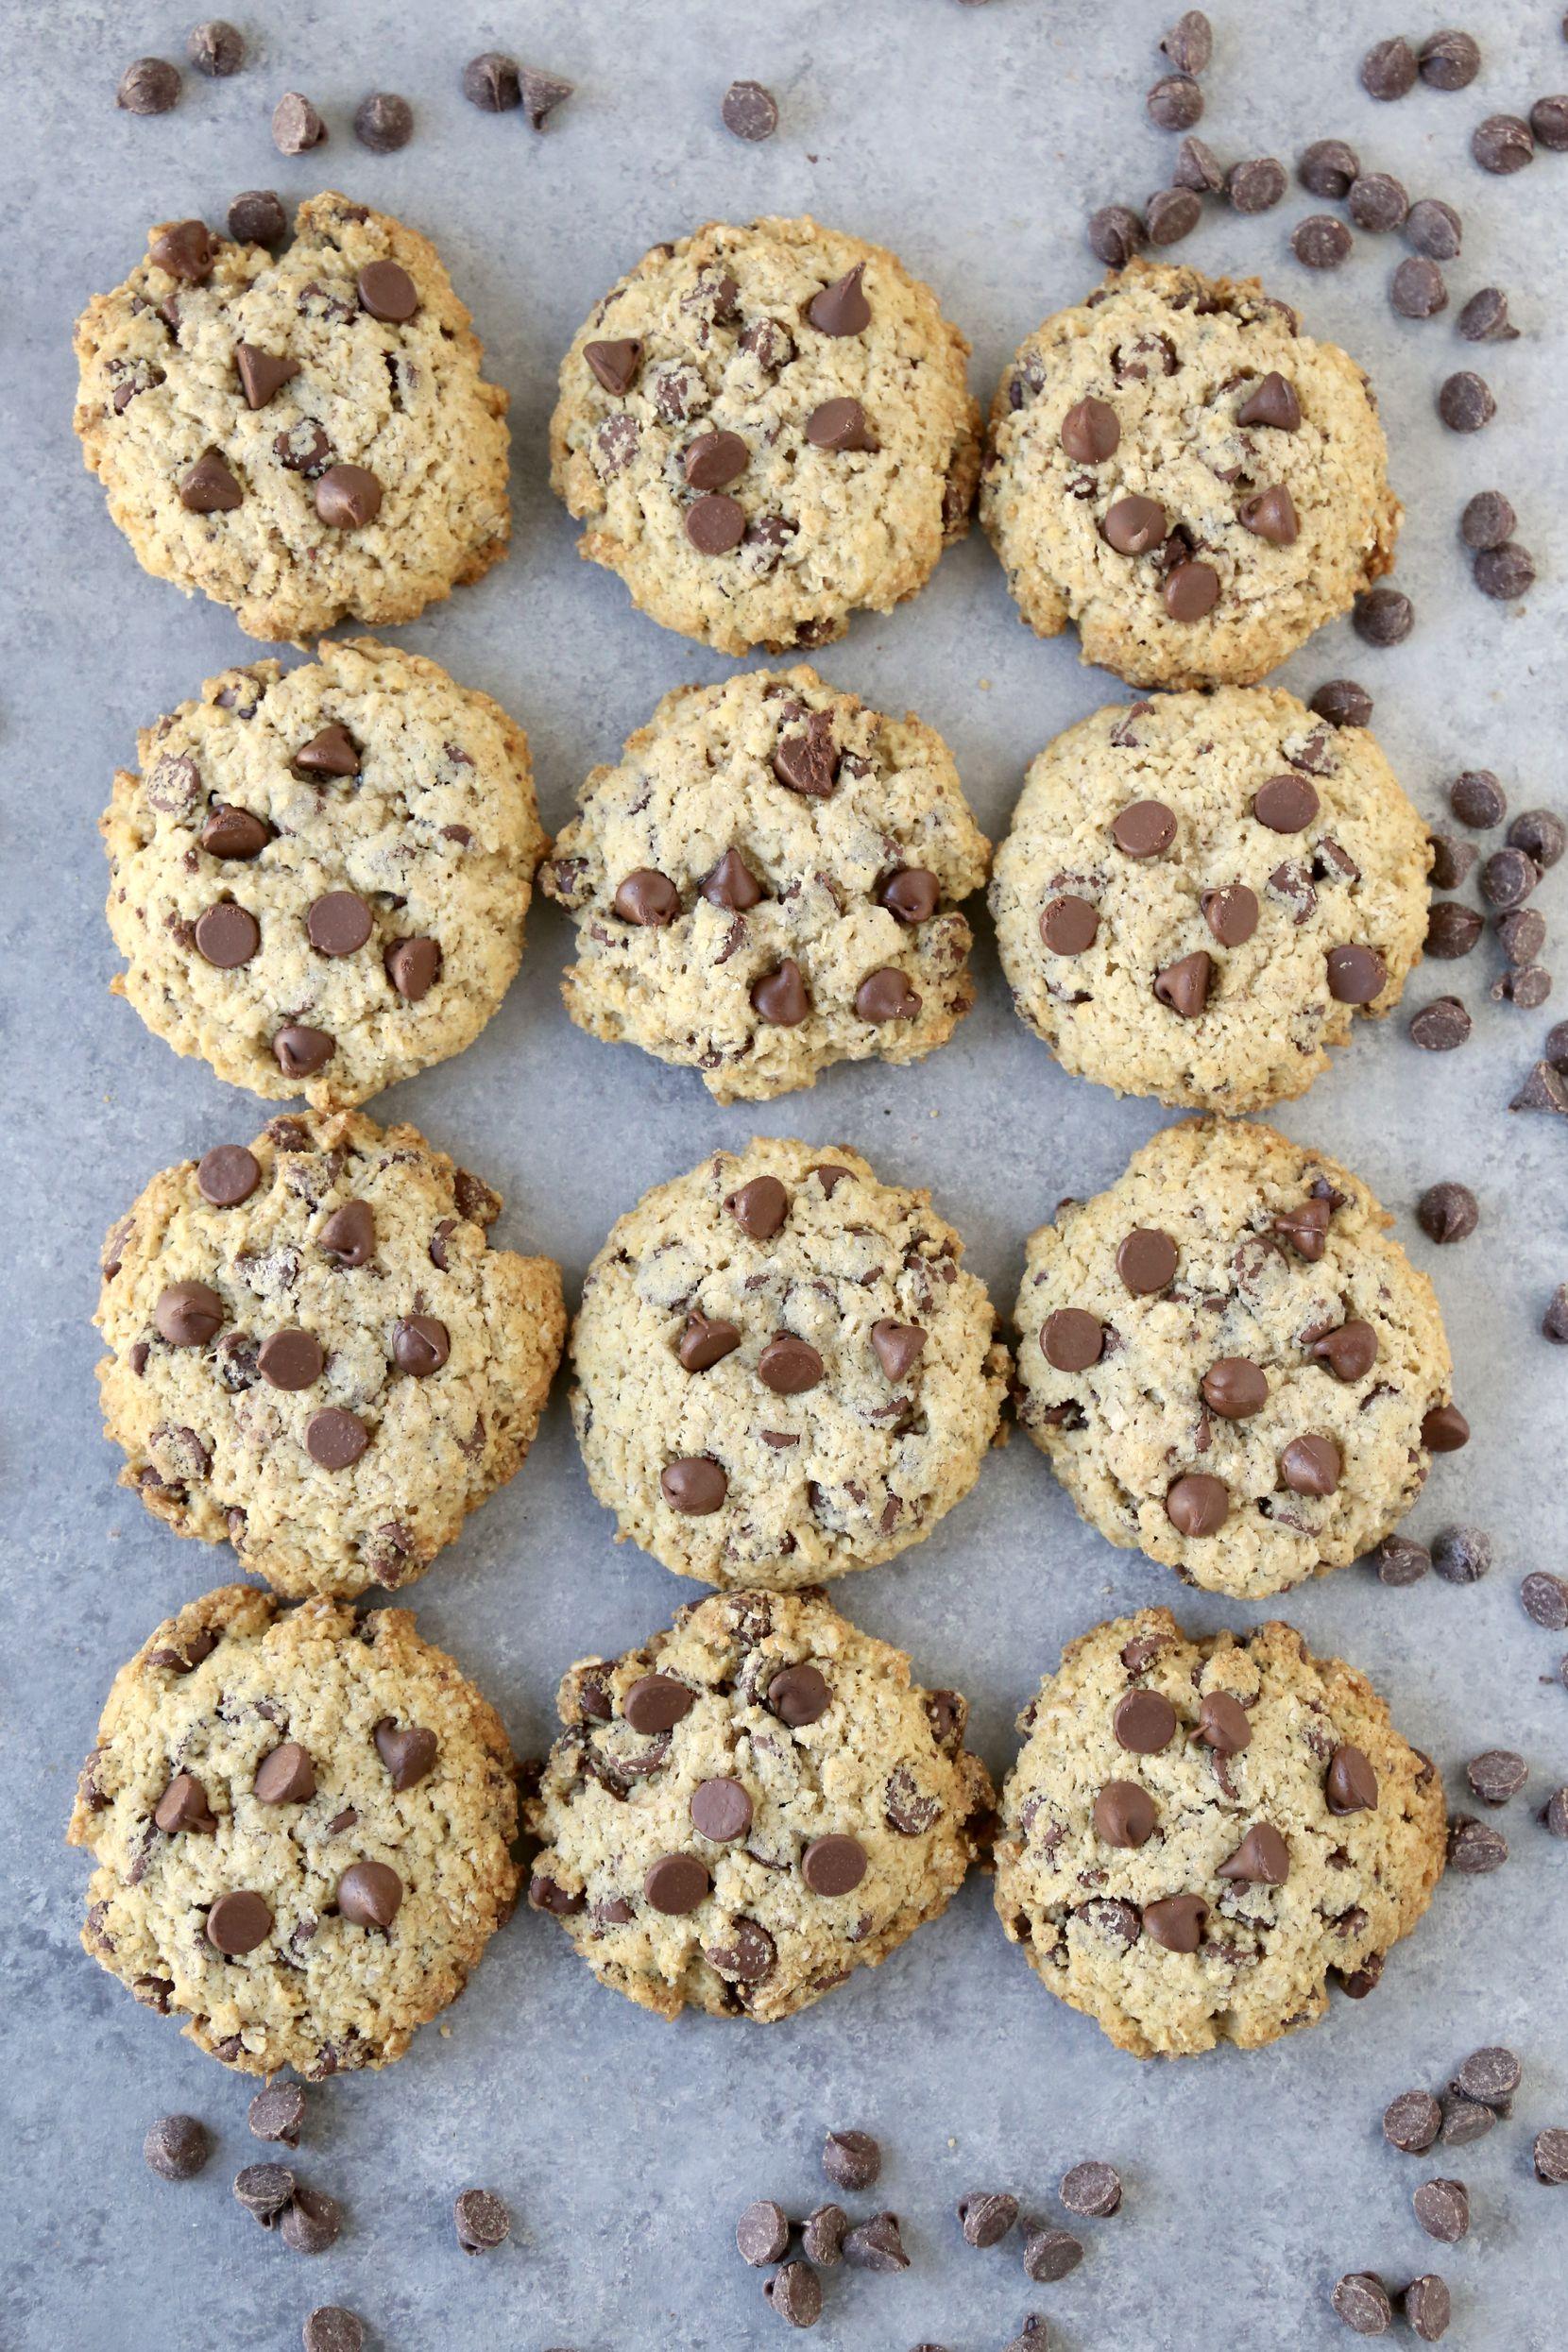 Monk Fruit Chocolate Chip Cookies